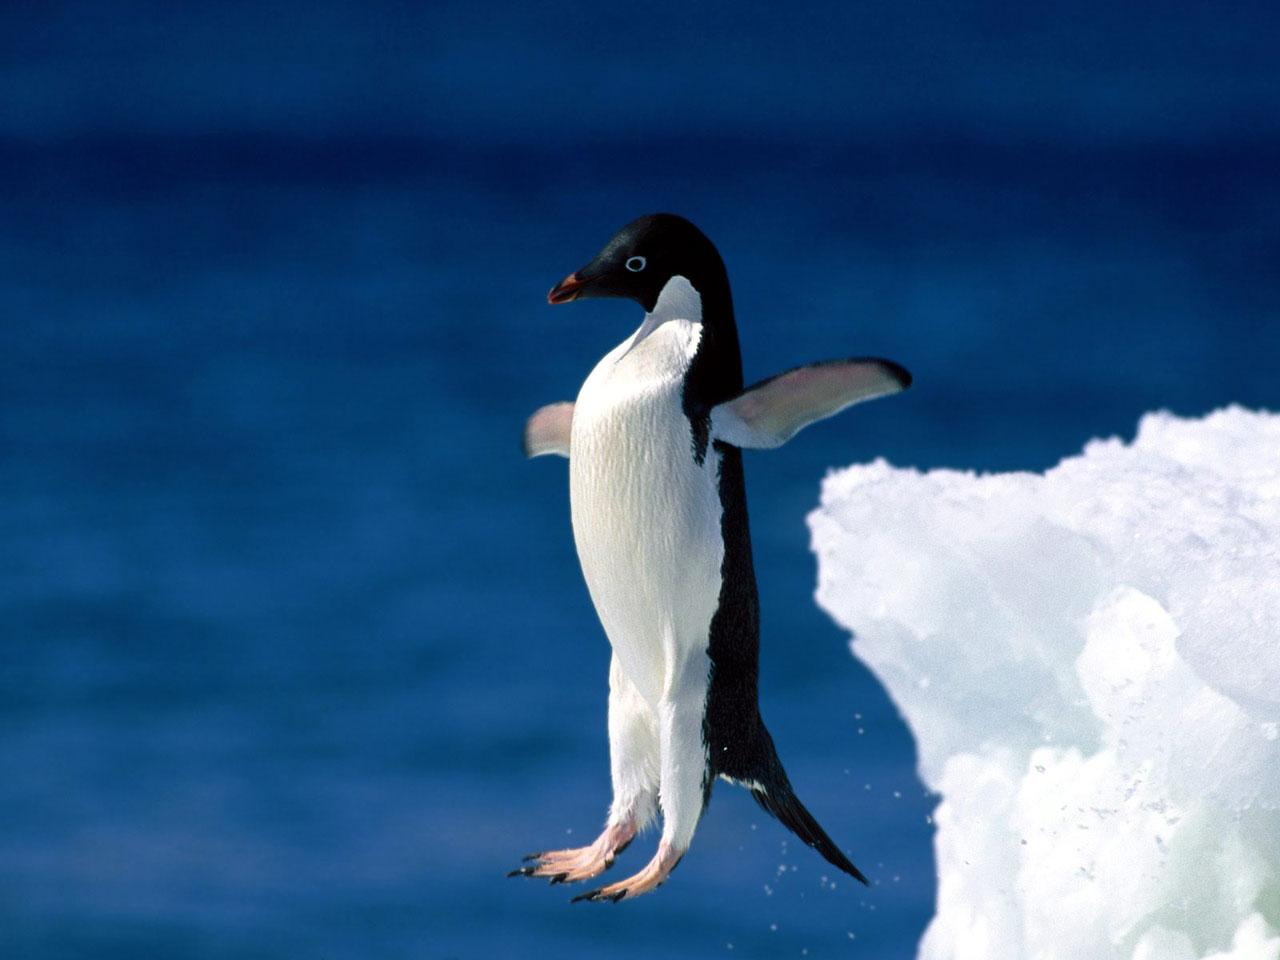 47] Moving Penguin Wallpapers on WallpaperSafari 1280x960